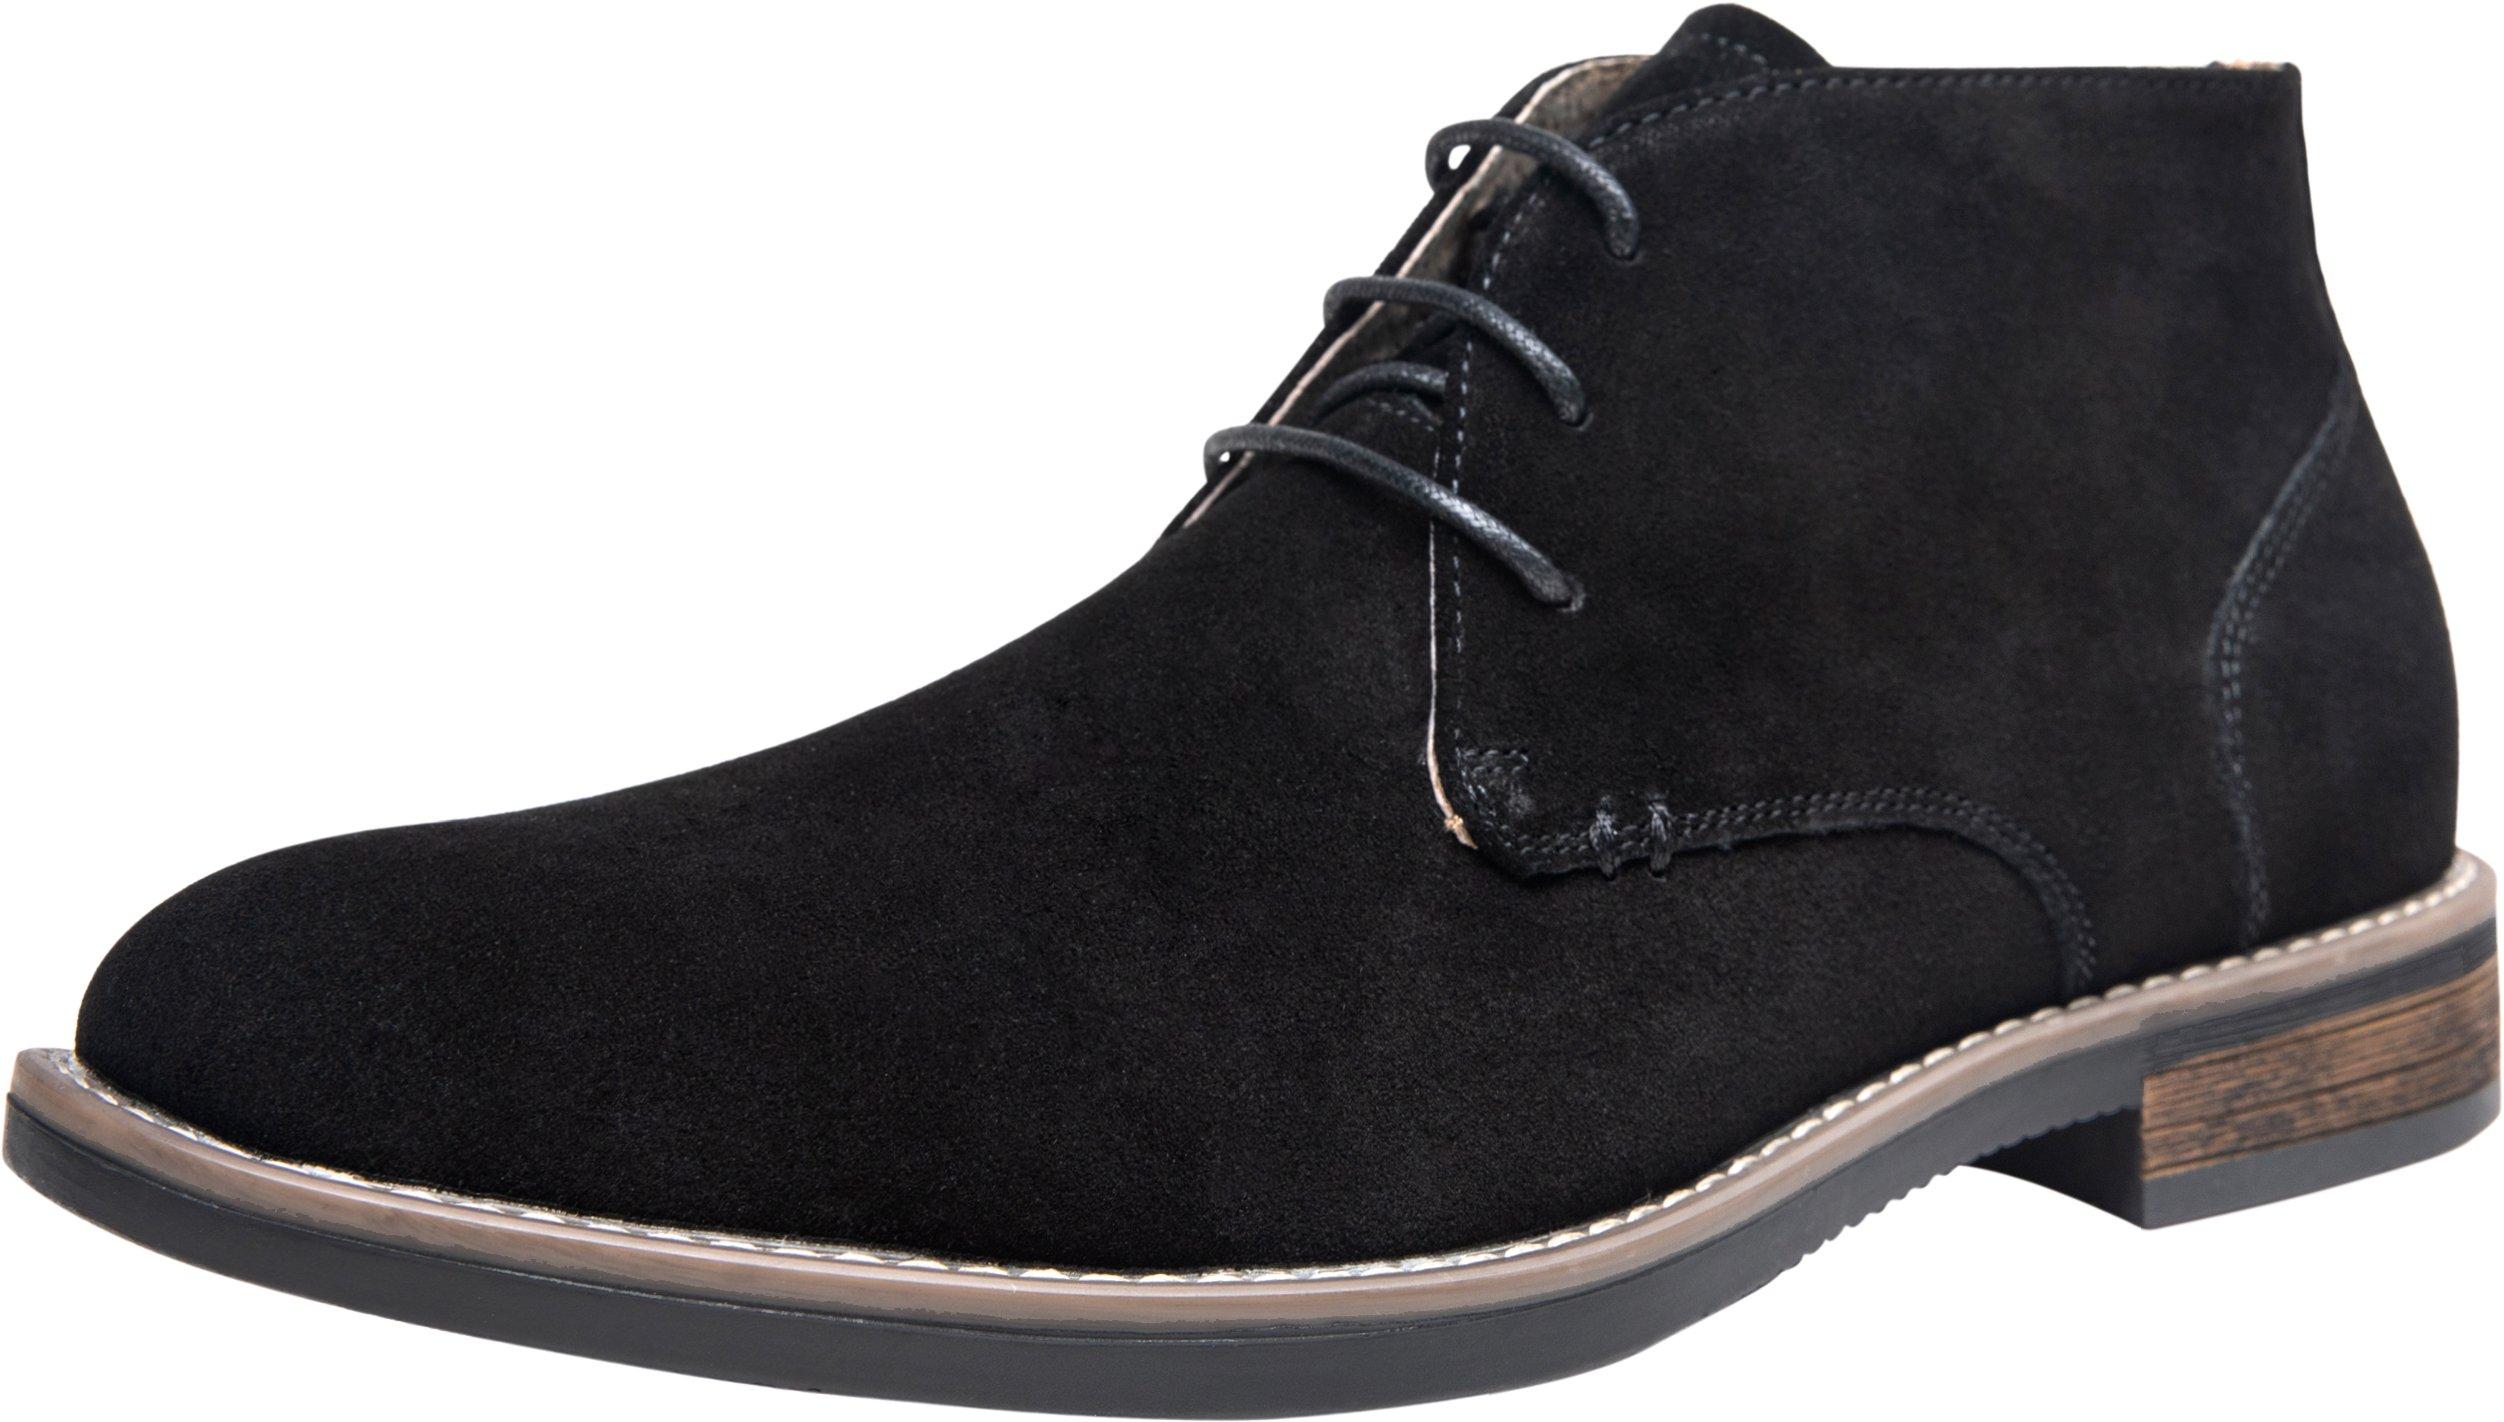 JOUSEN Men's Chukka Boots Classic Suede Desert Boot (13,Black) by JOUSEN